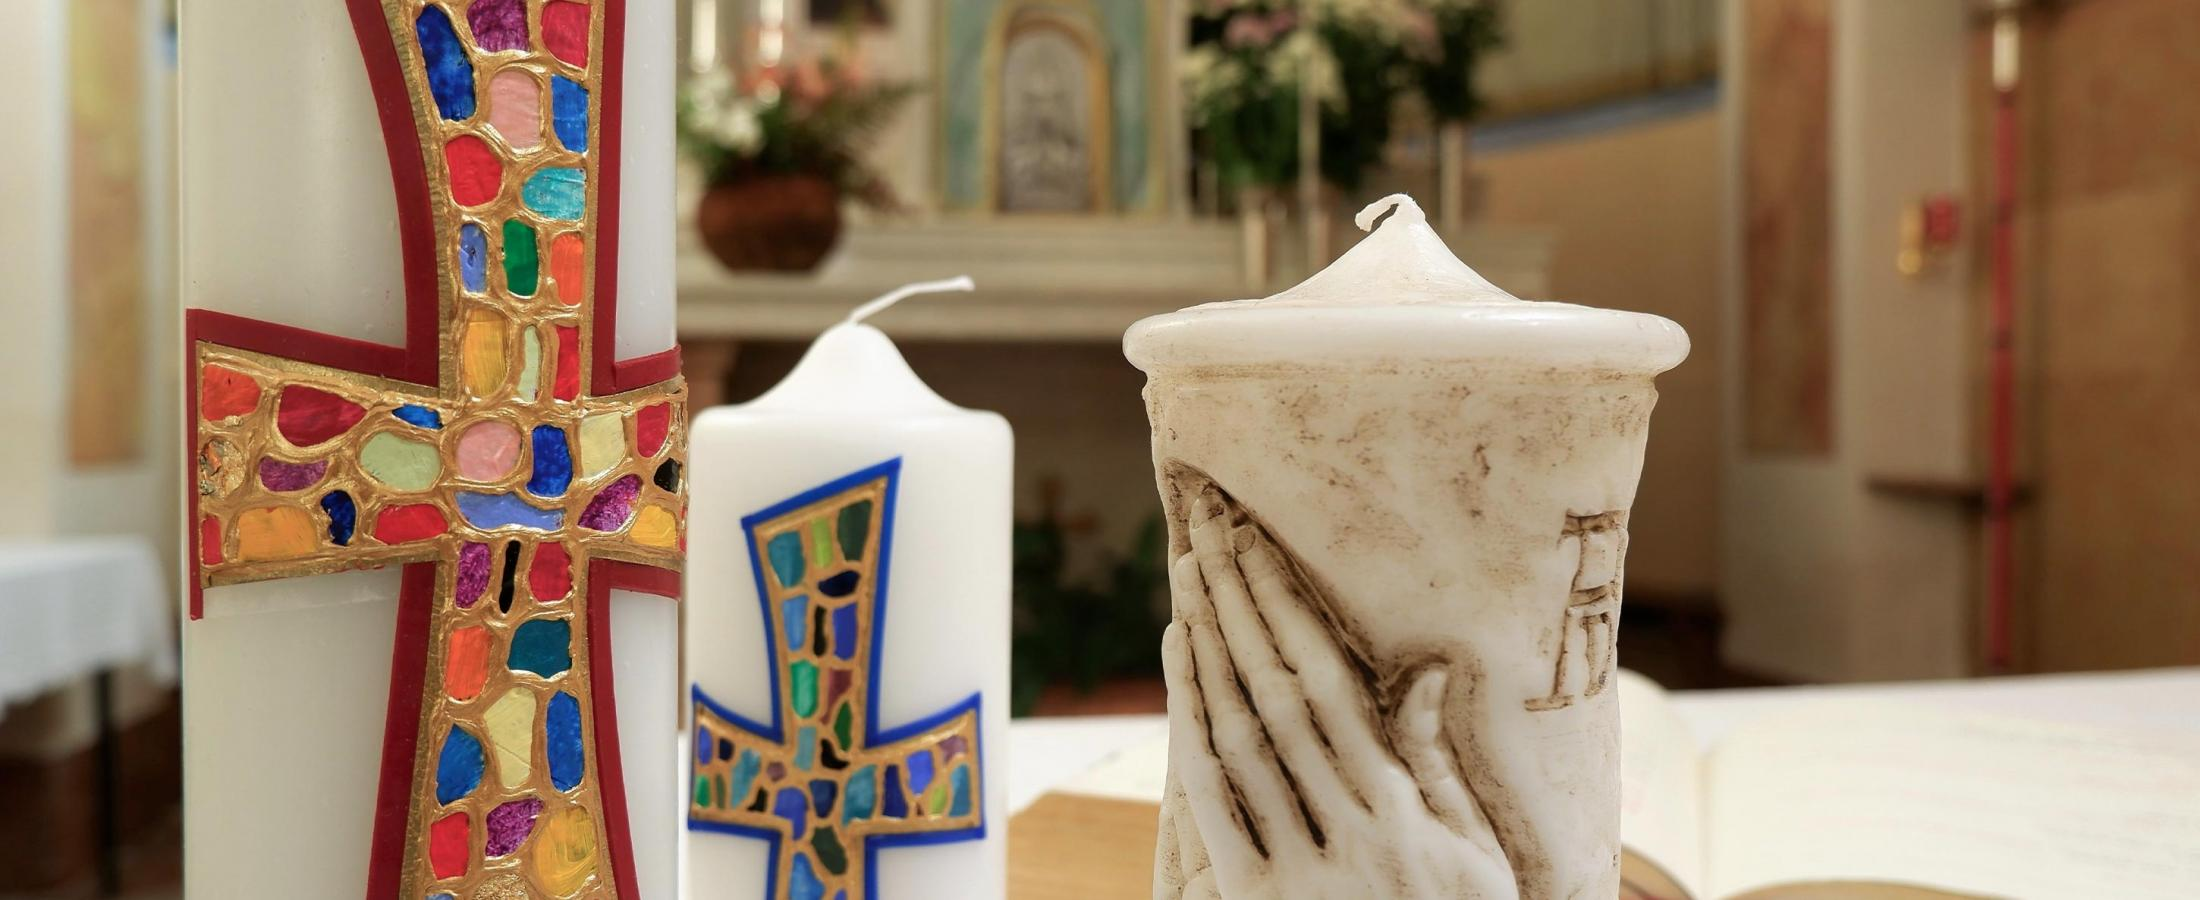 candele religiose - categoria